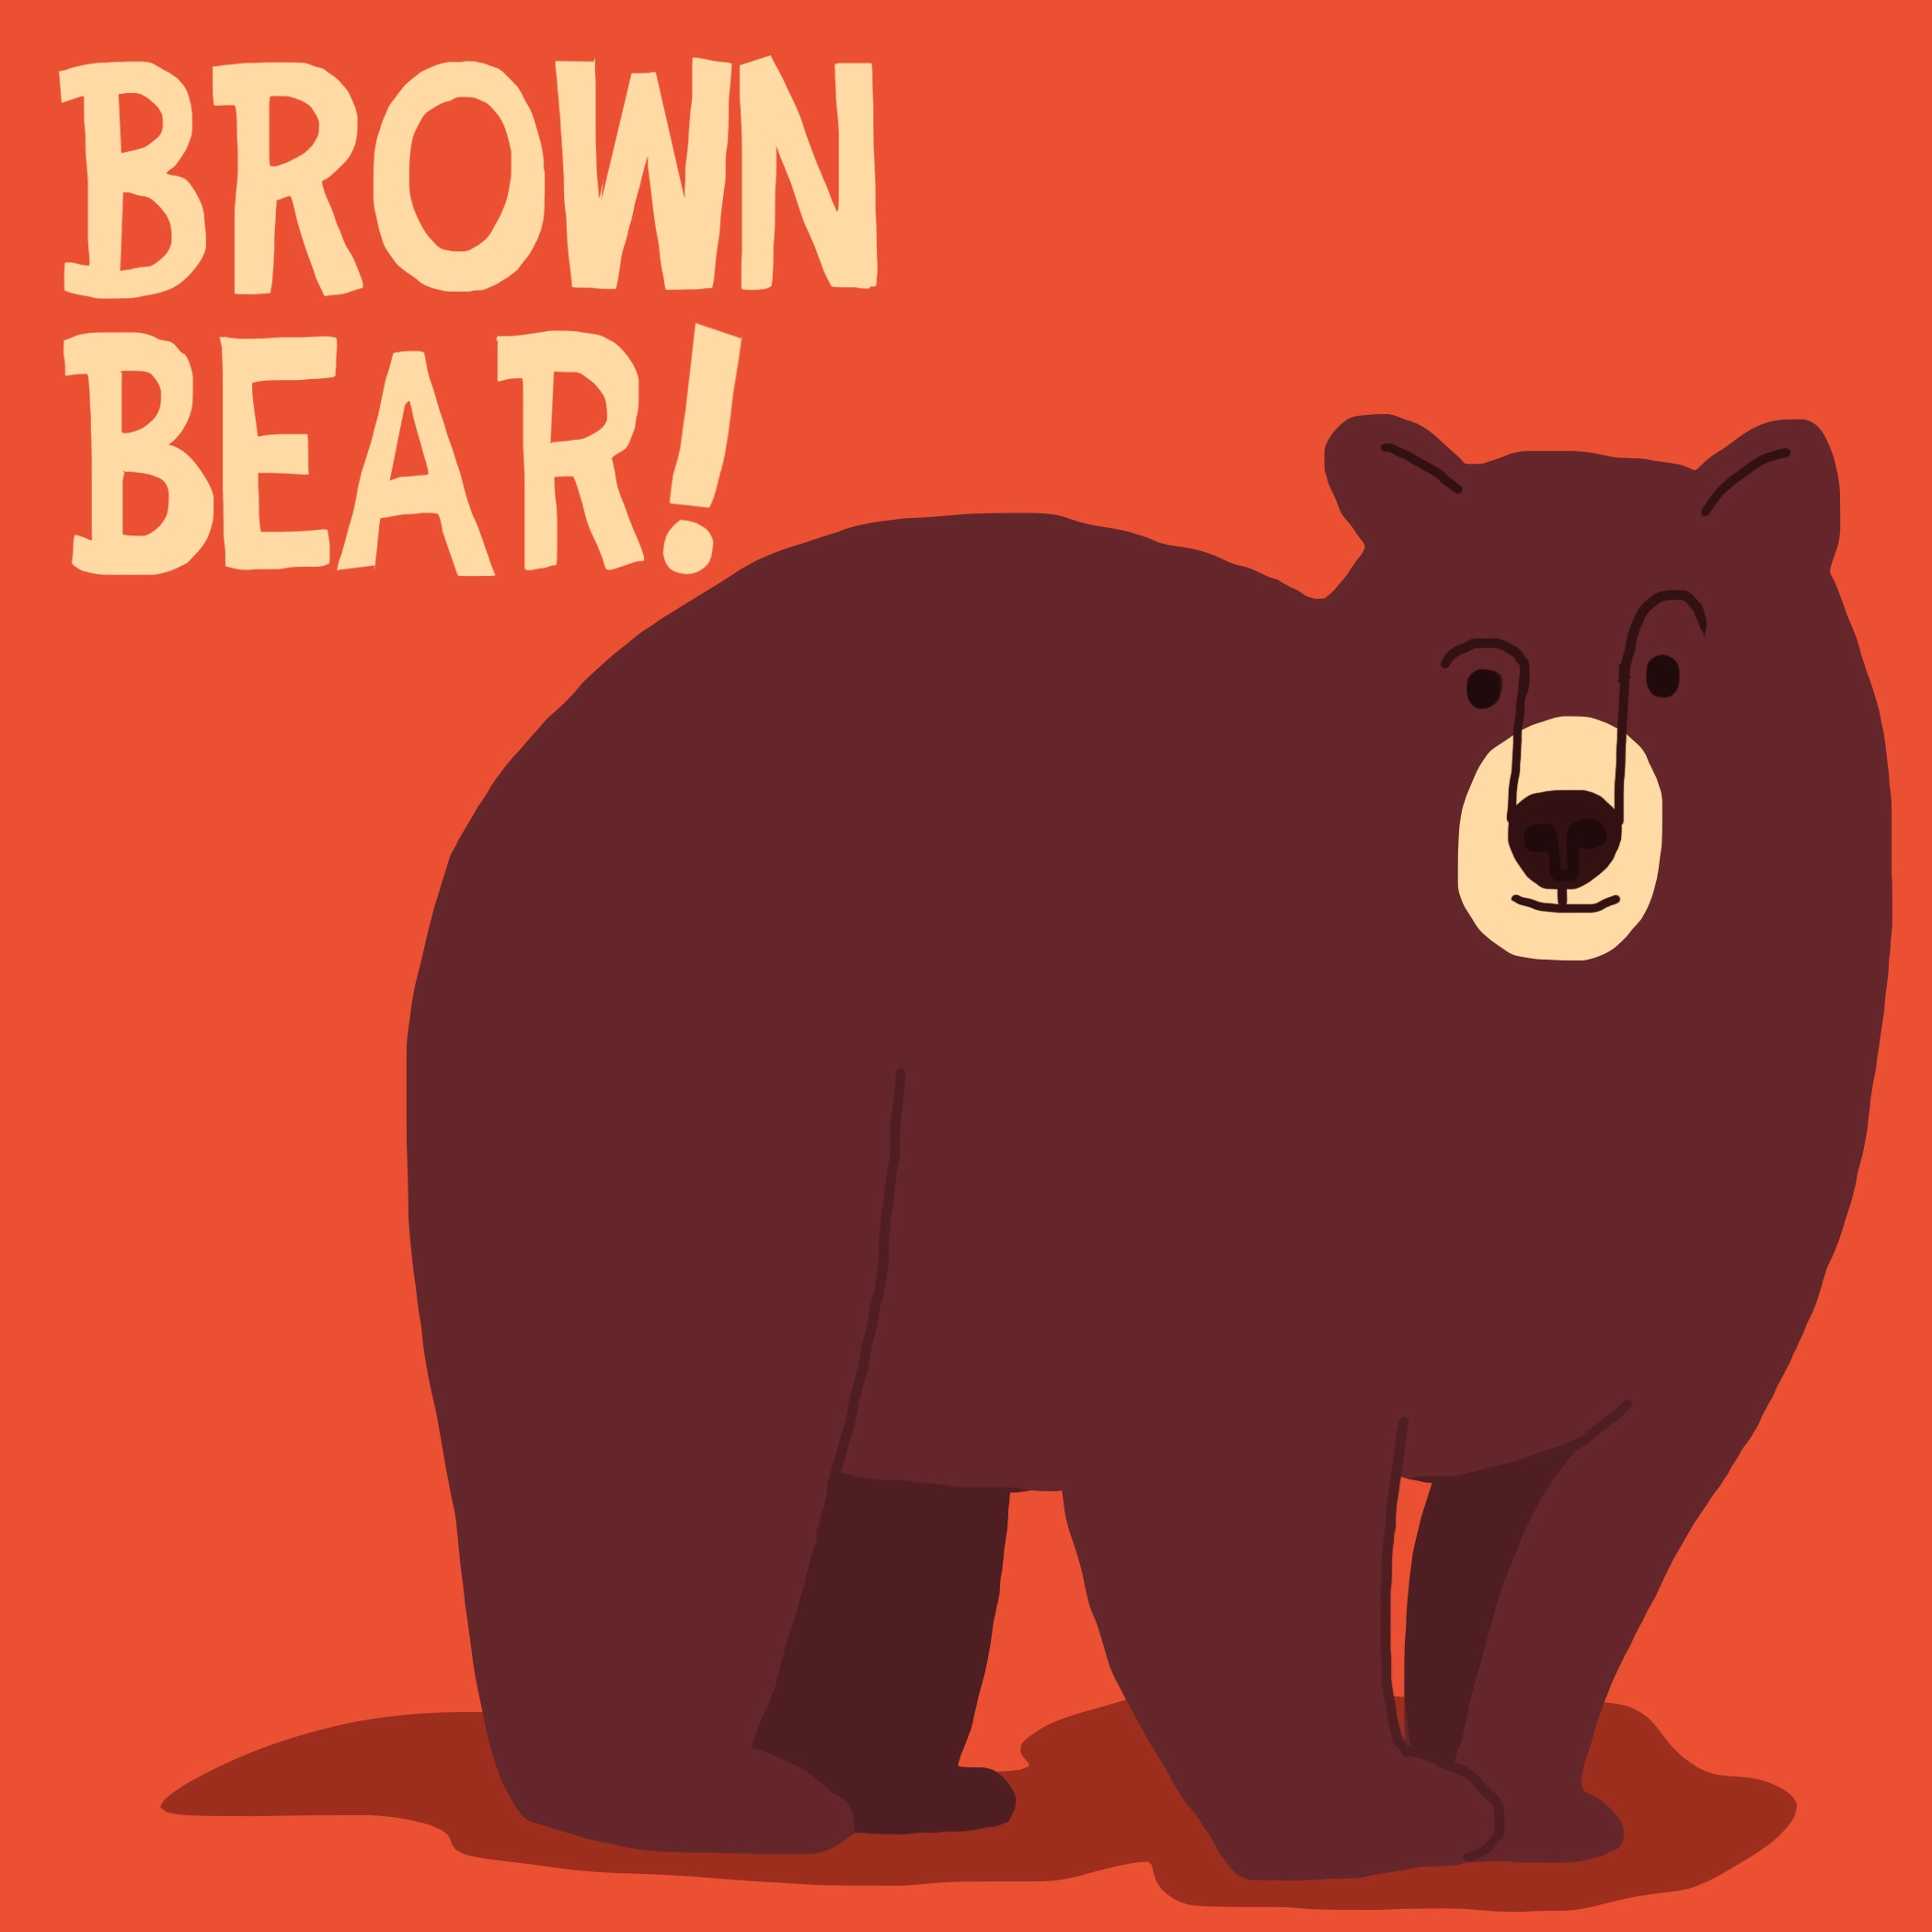 brown bear social post.jpg